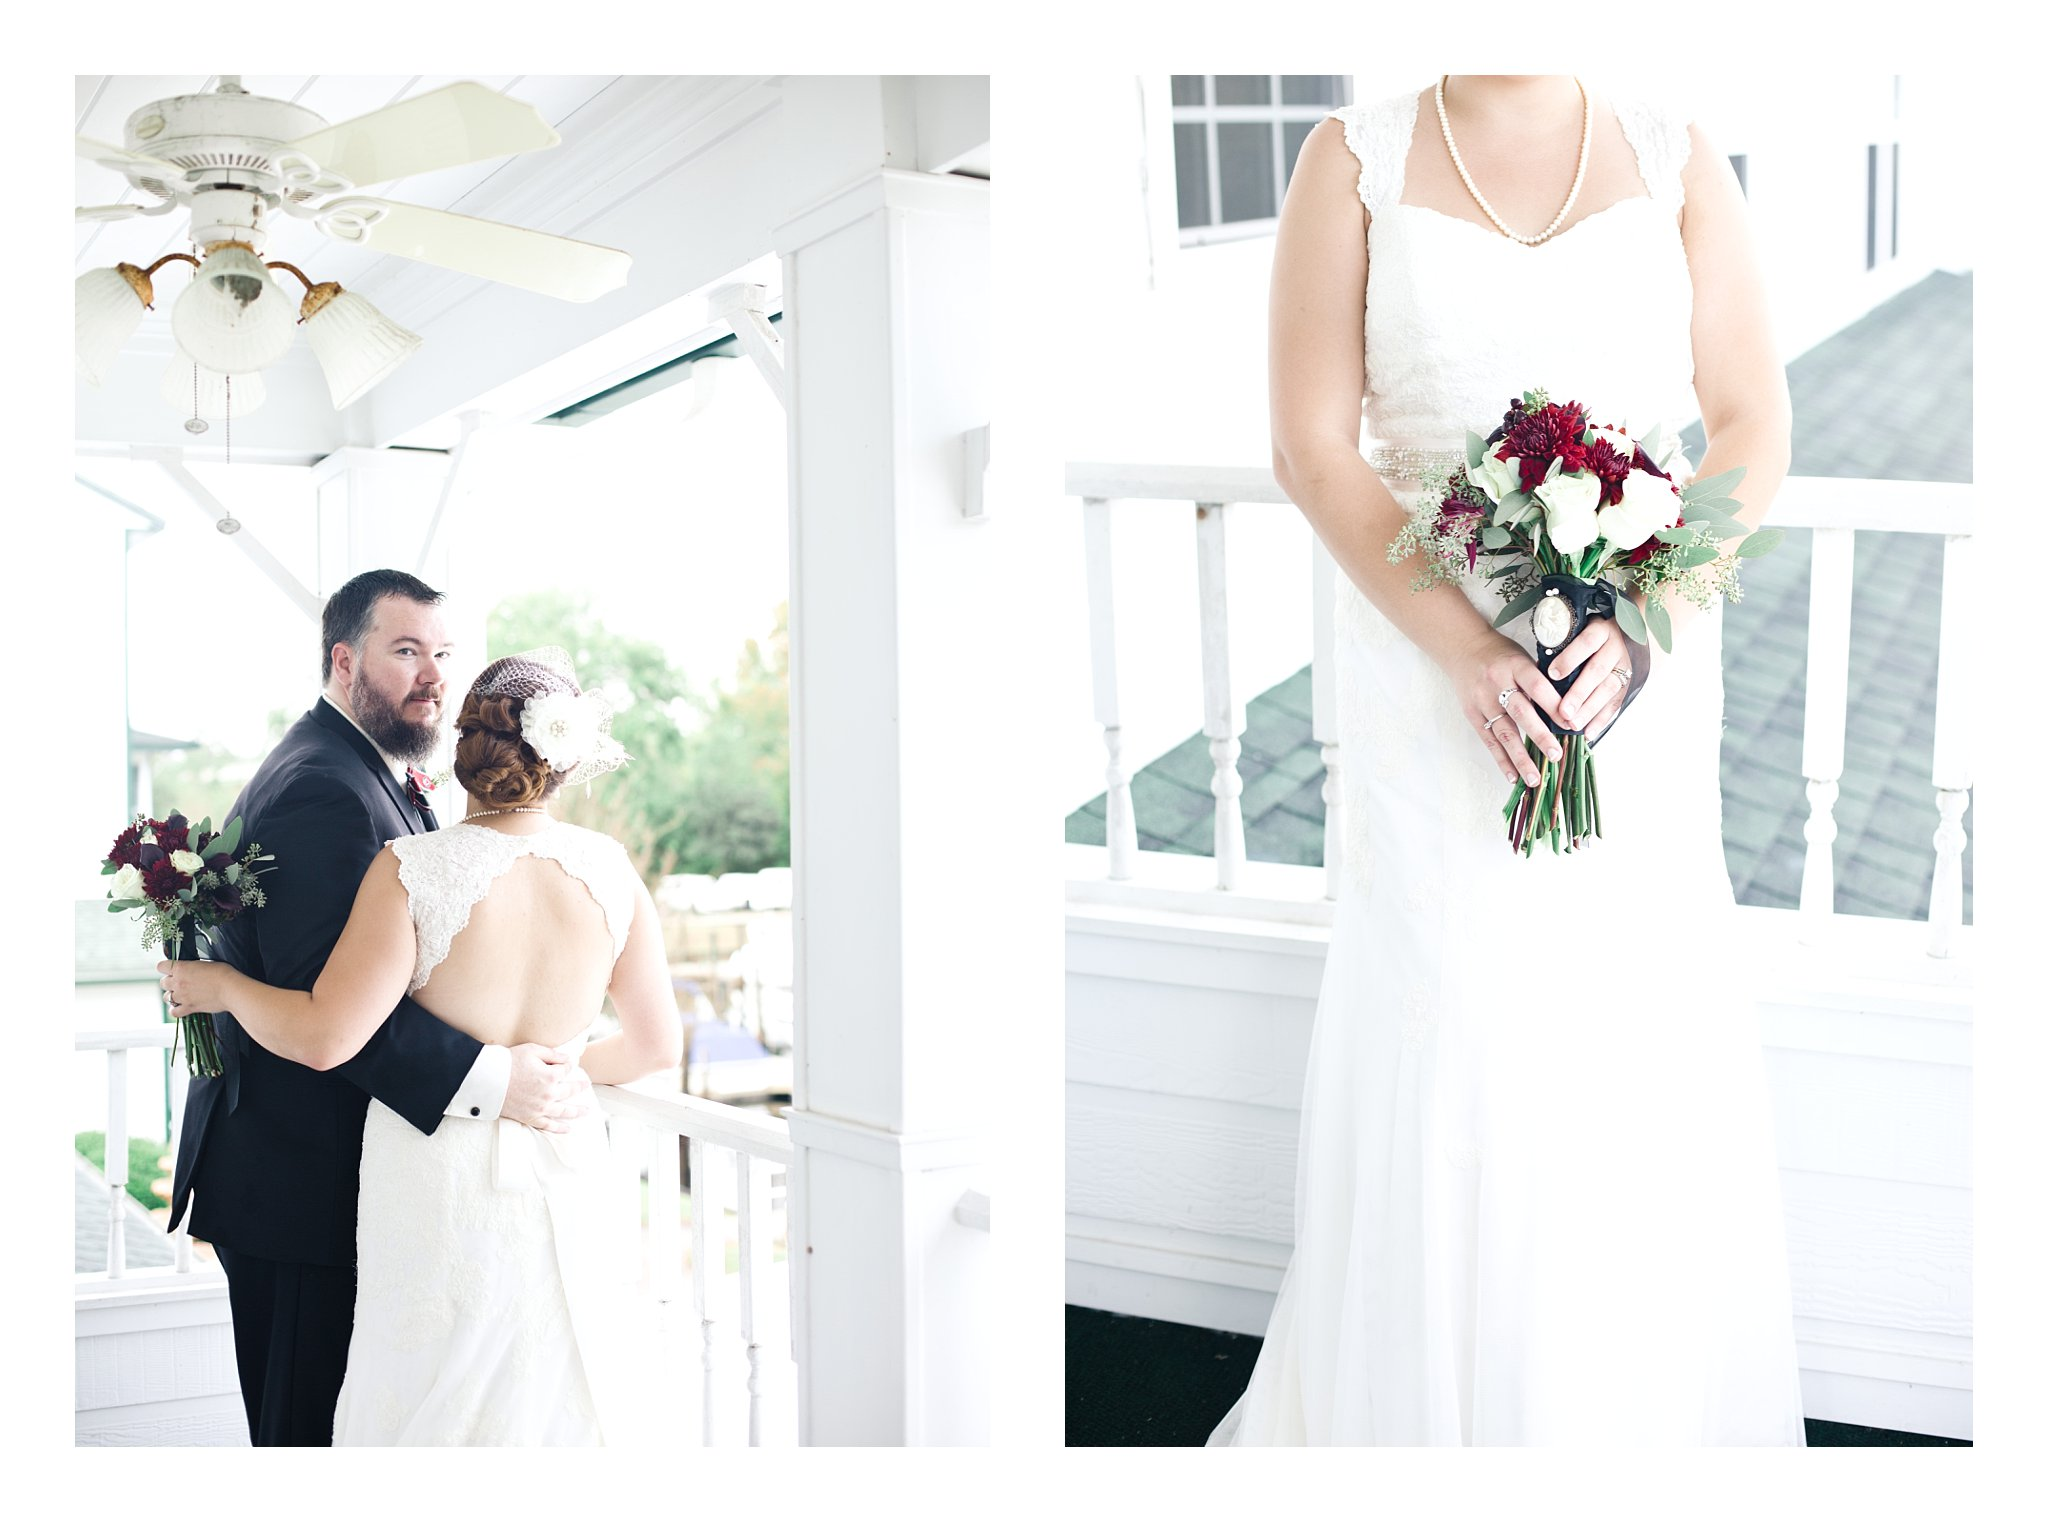 cypress-inn-garnet-black-lowcountry-vintage-wedding-conway-sc-photos_0144.jpg